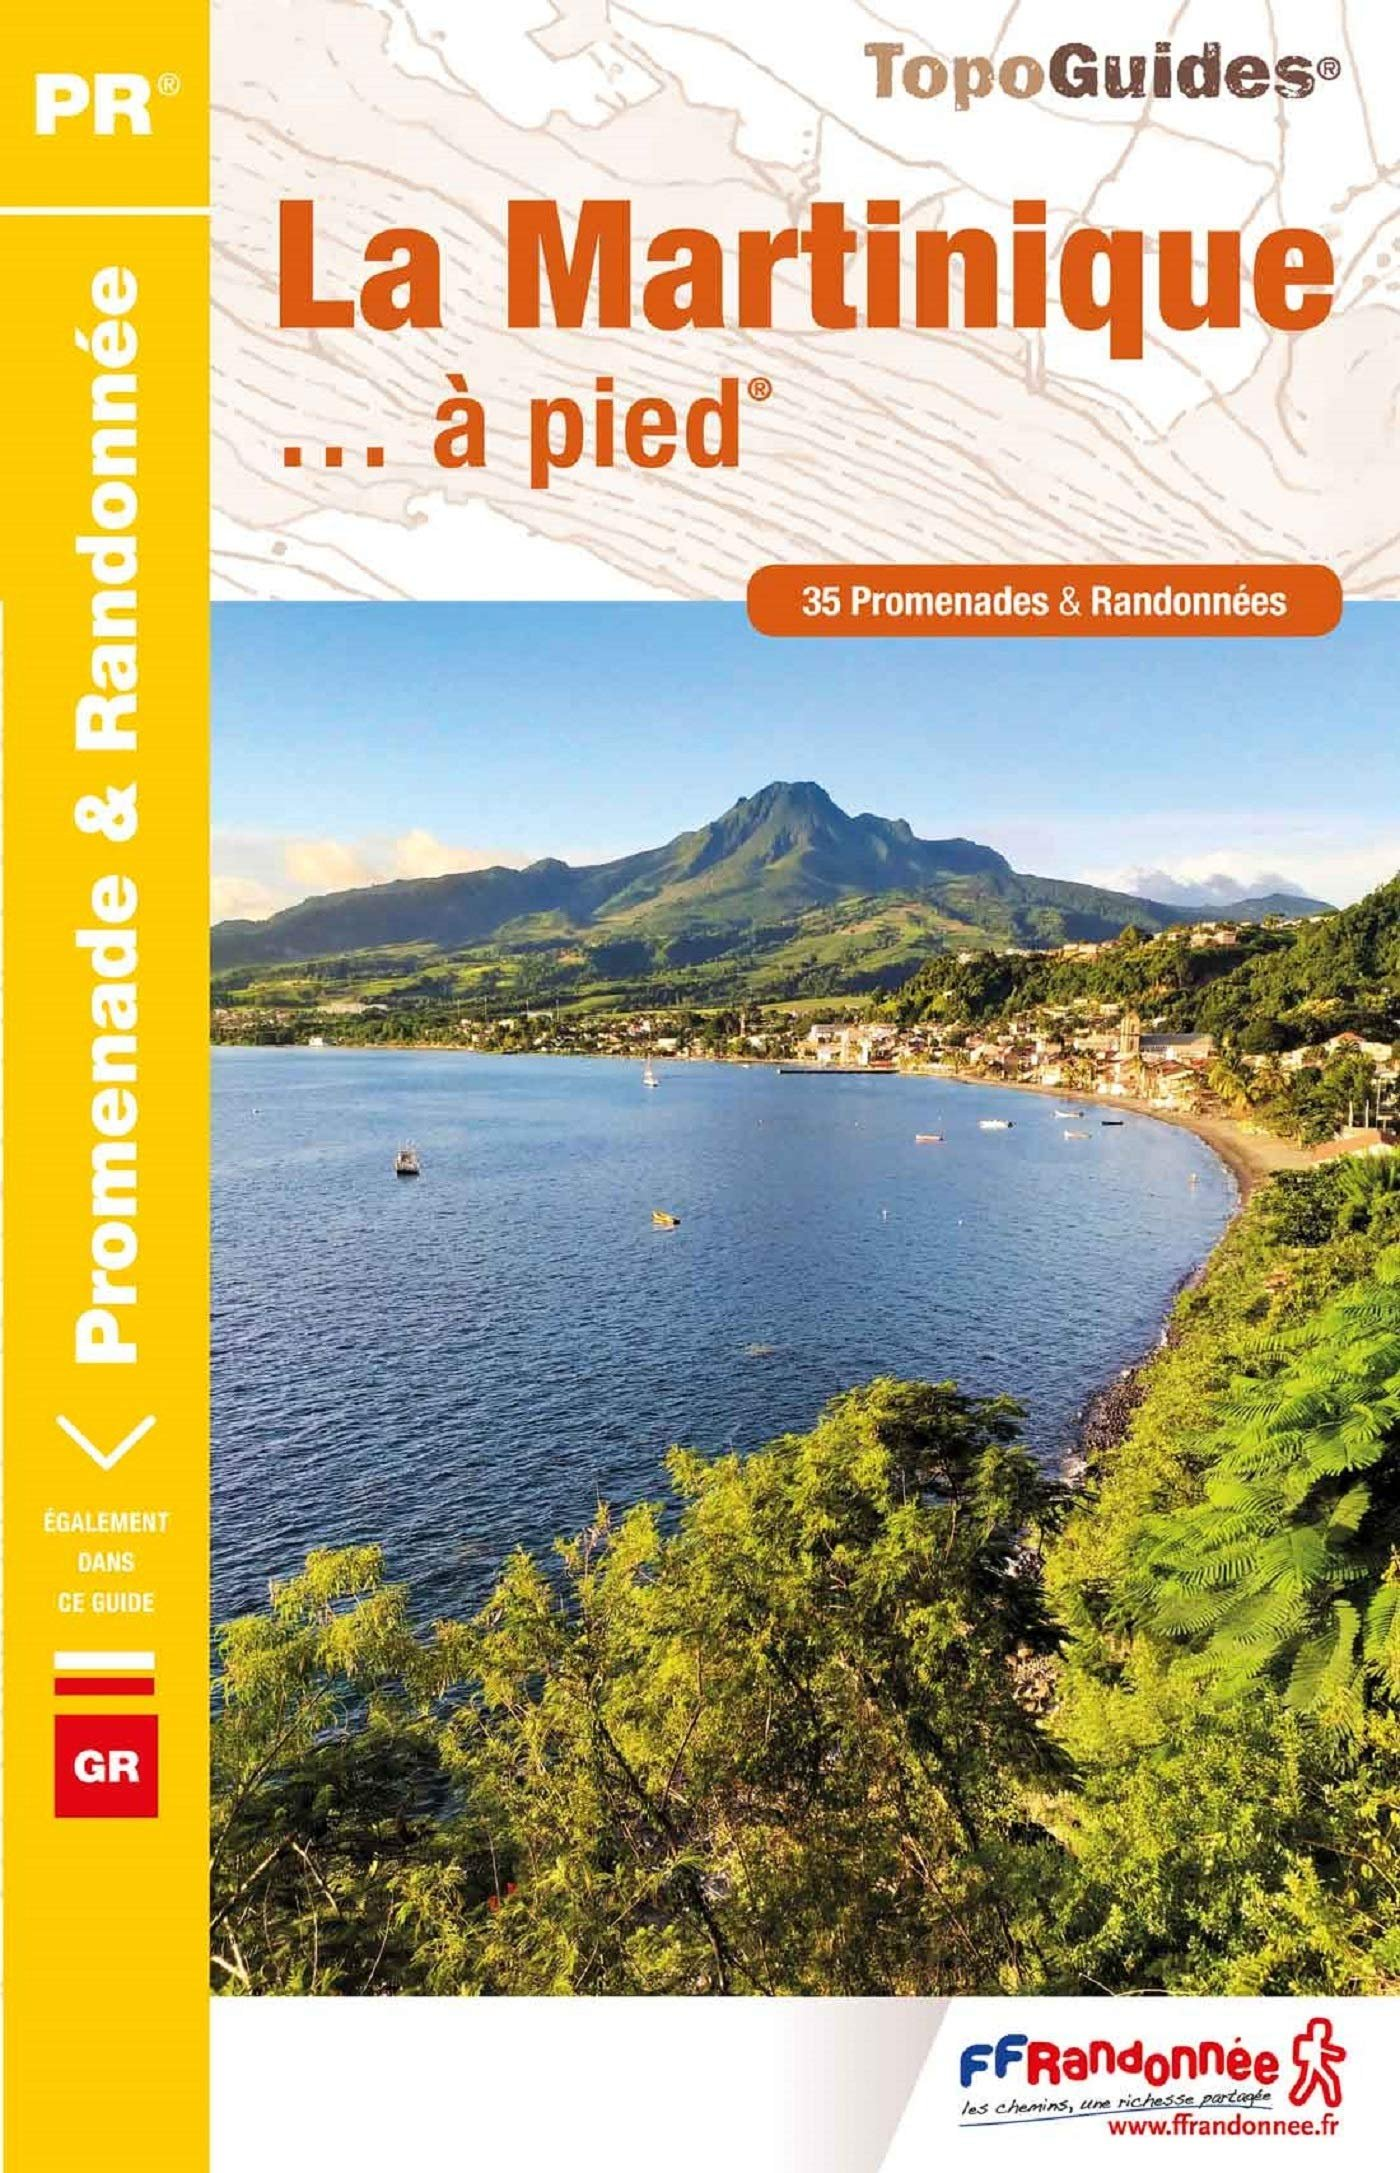 D972  Martinique à pied | wandelgids 9782751403552  FFRP Topoguides  Wandelgidsen Overig Caribisch gebied